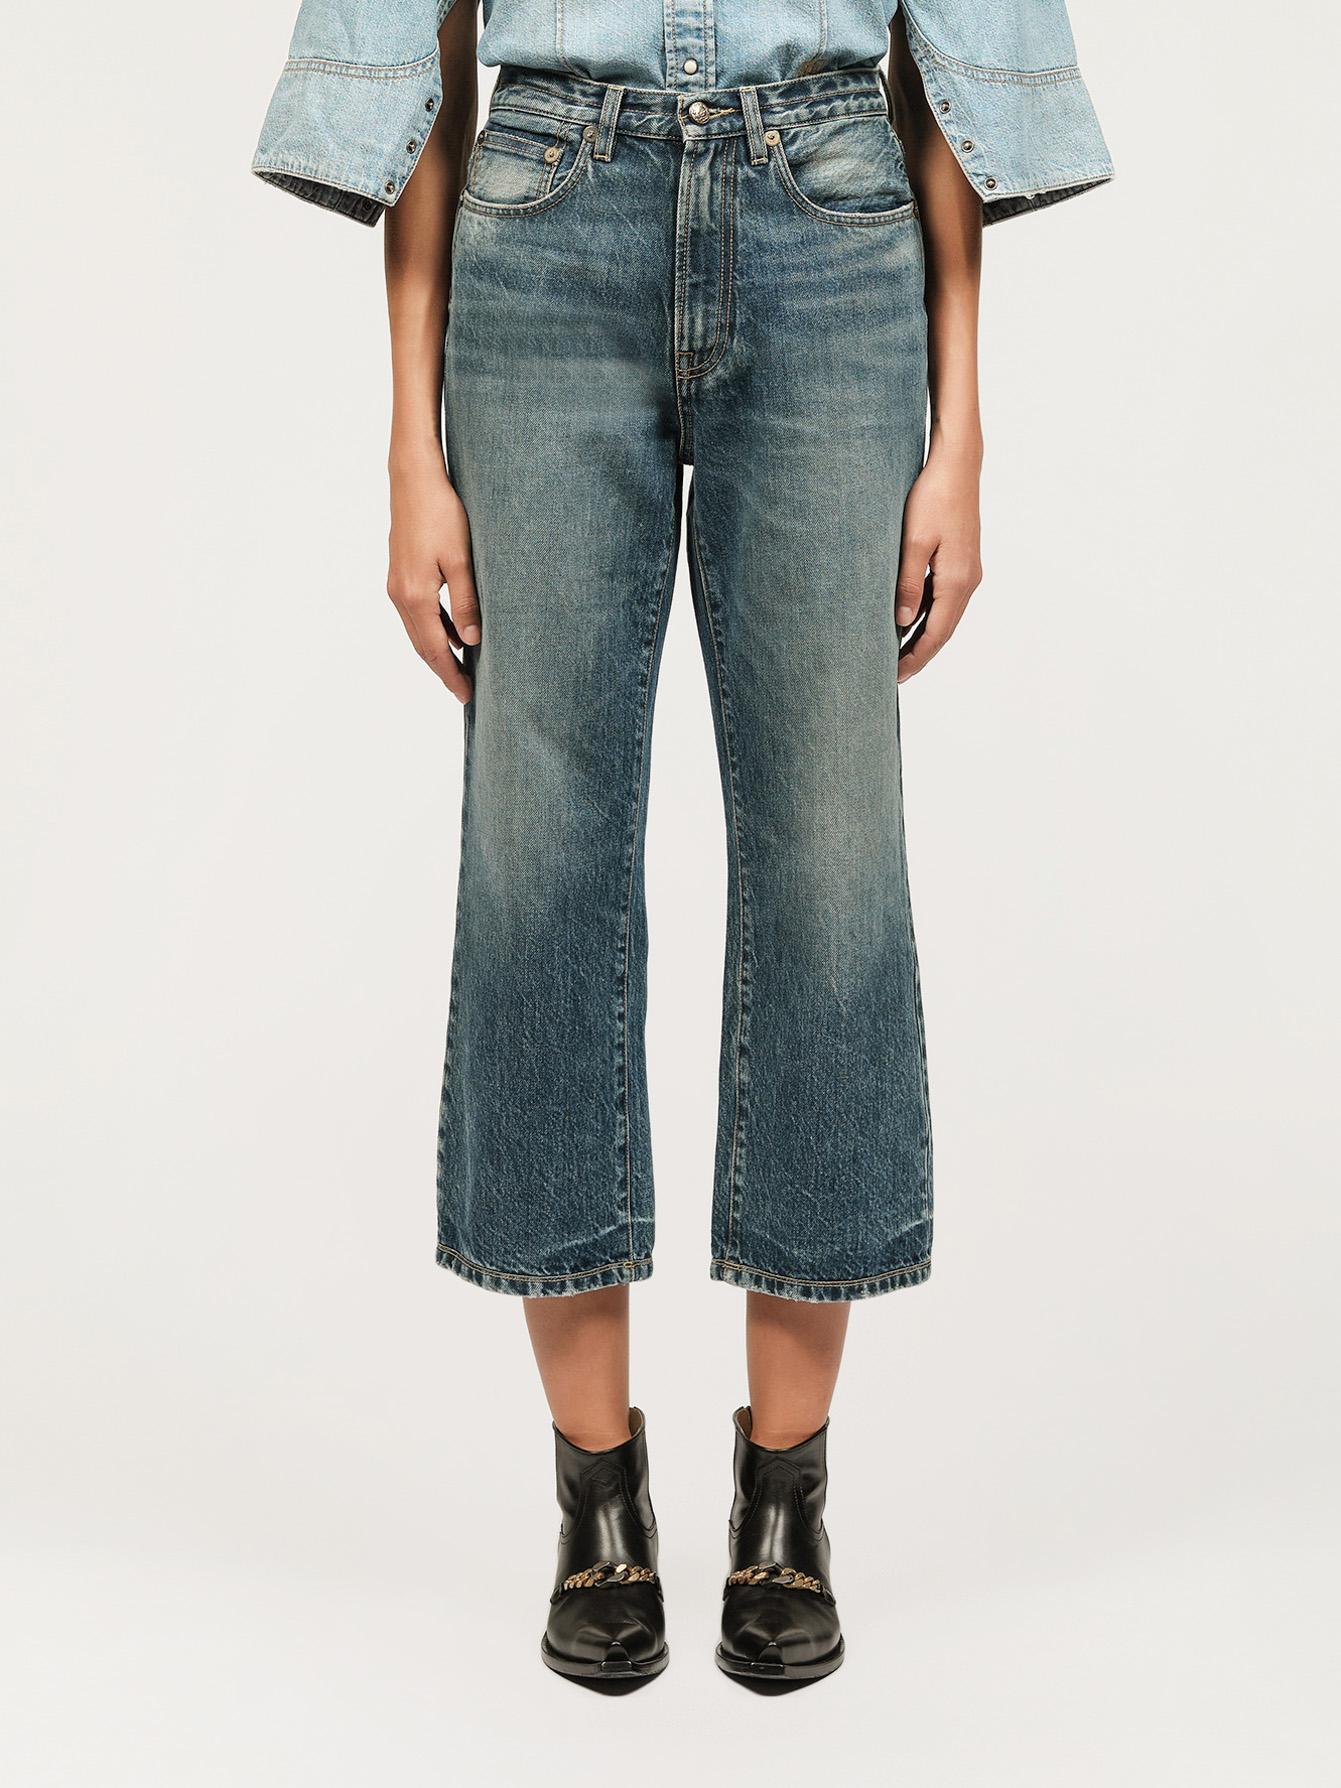 Washed denim boyfriend jeans Small Image 2